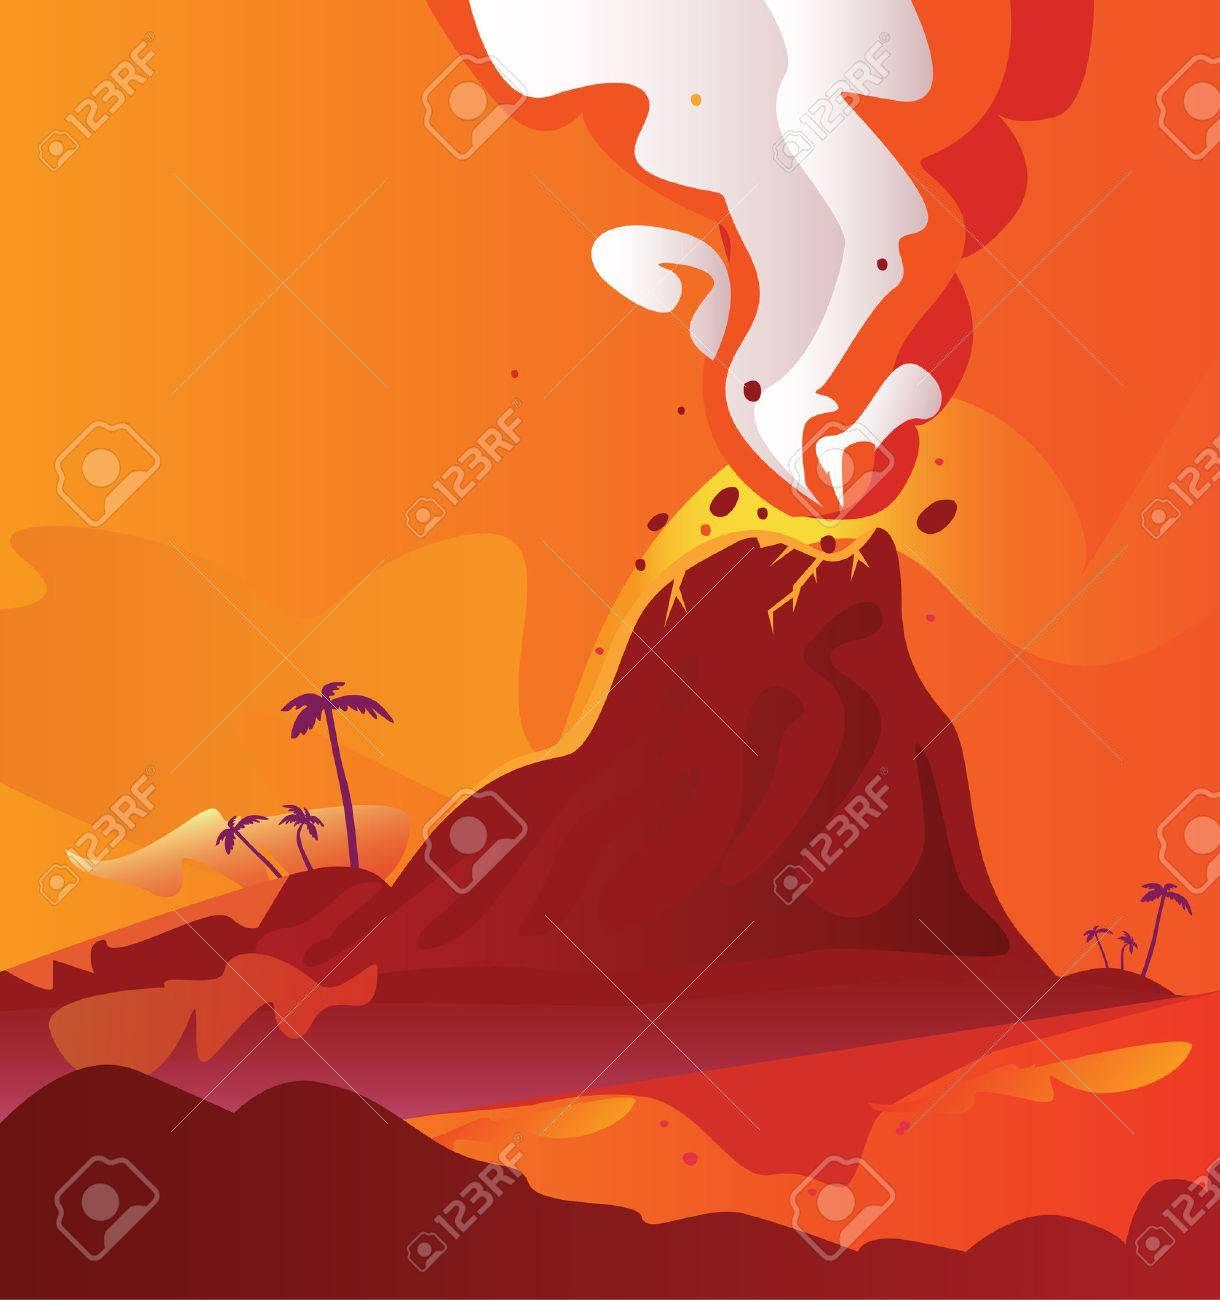 Volcano with burning lava. Vector Illustration of volcano eruption. Stock Vector - 4903090